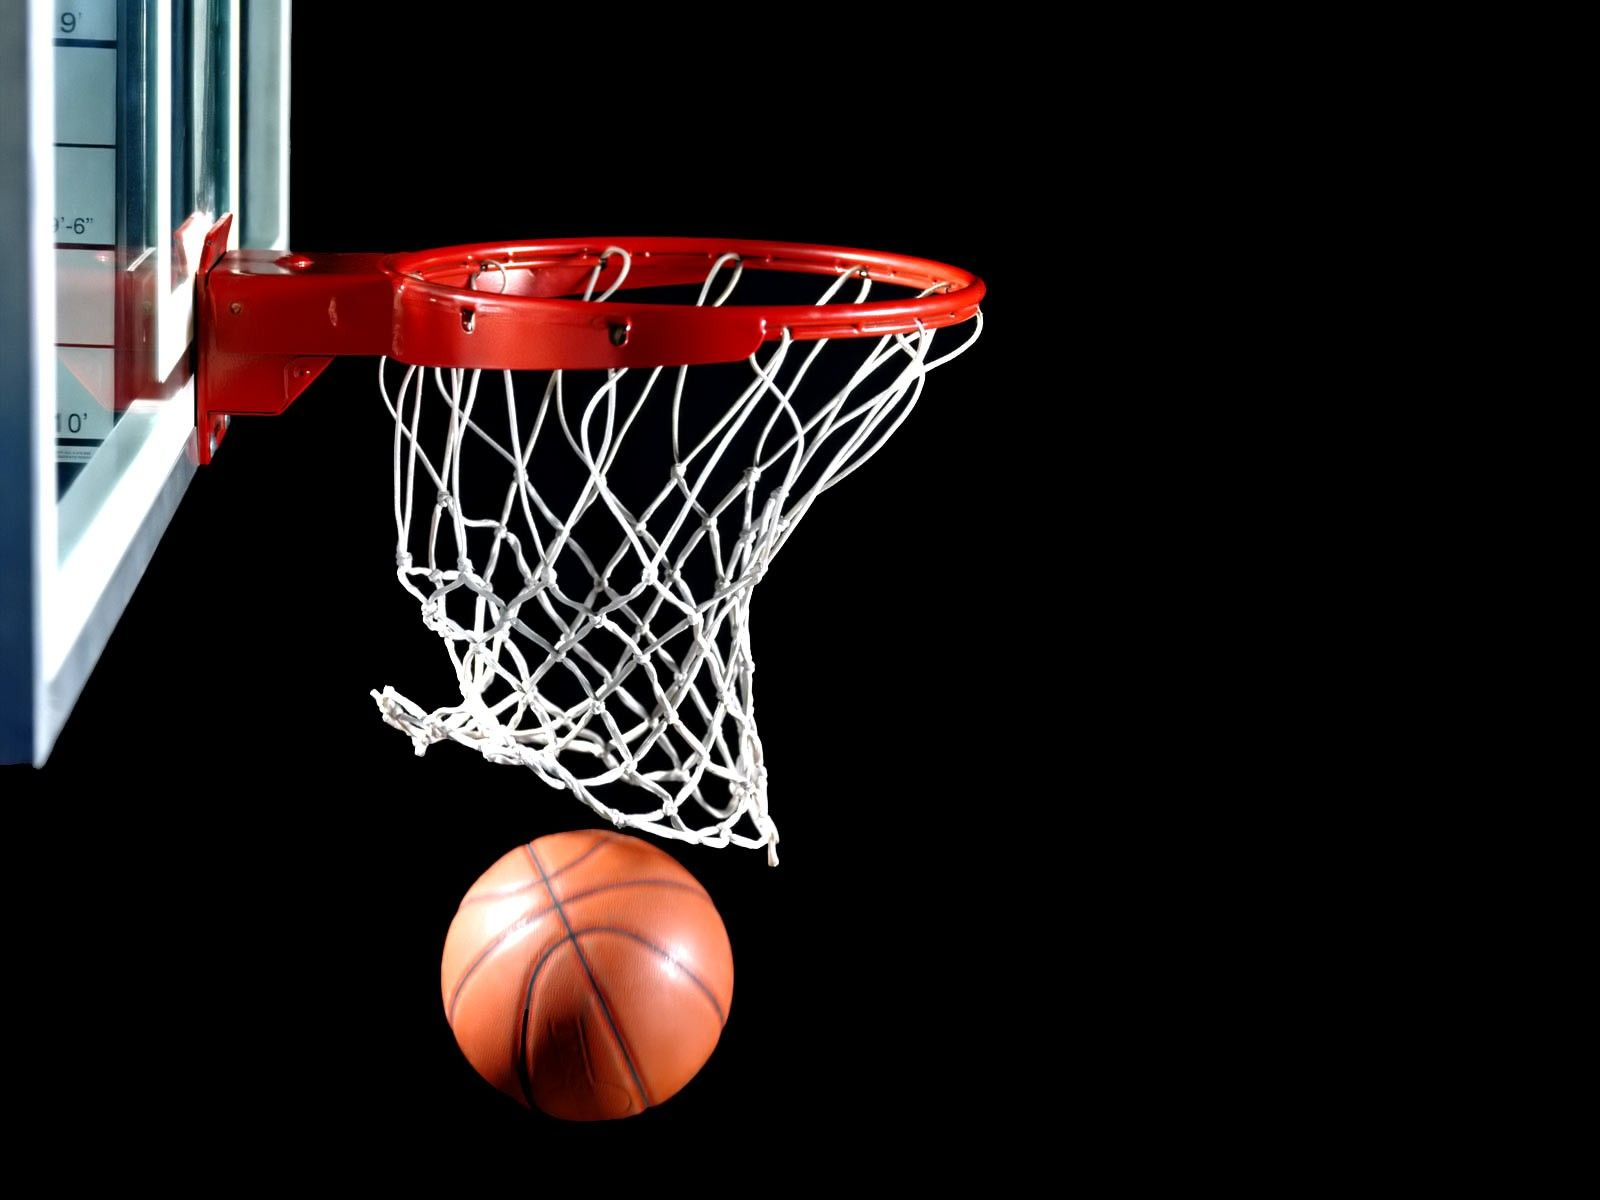 Shooting Hoops Cool basketball wallpapers Basketball wallpaper 1600x1200